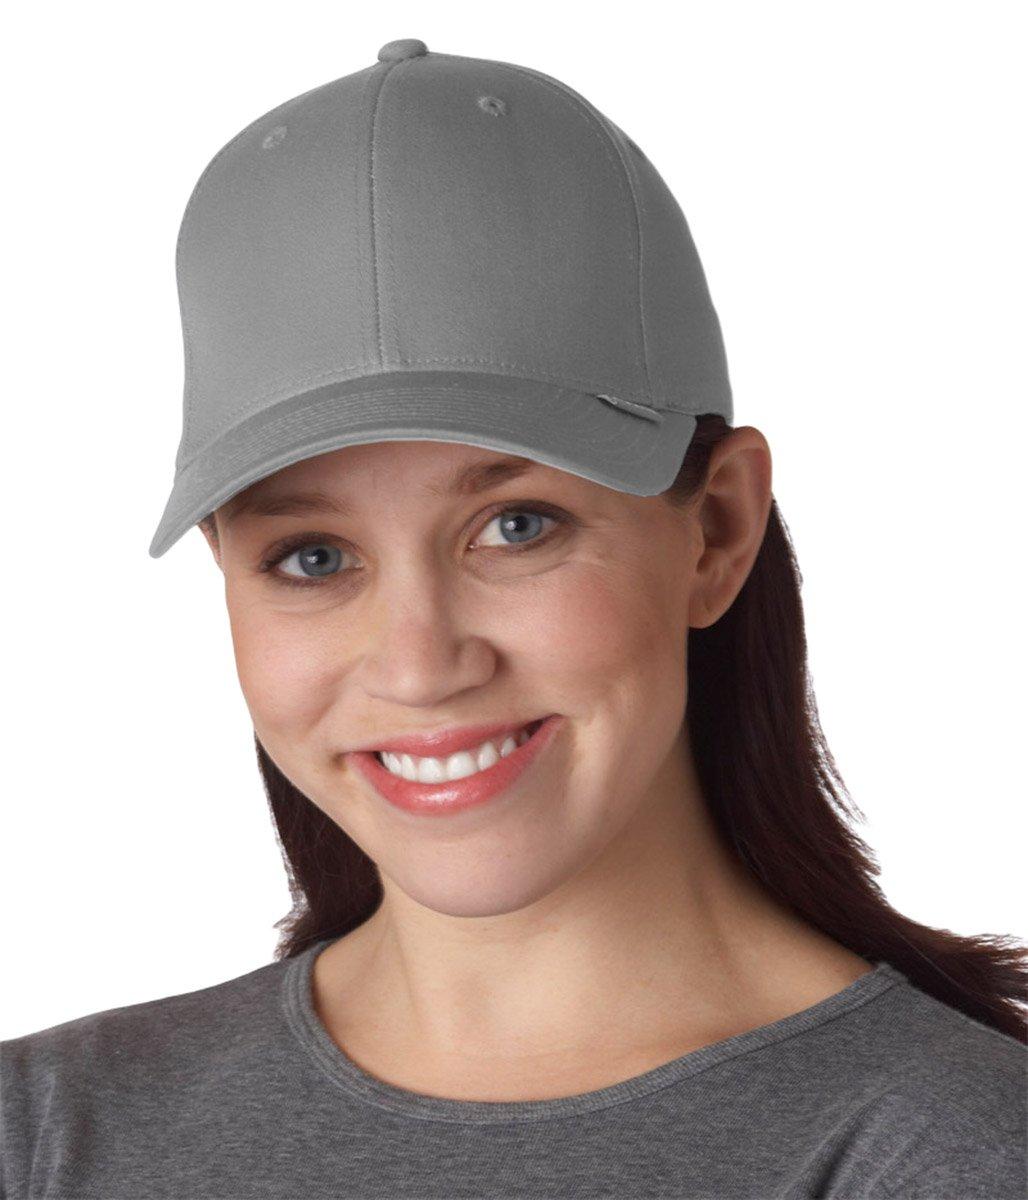 Flexfit V-Flex Twill Cap 5001,Cool Grey,S/M